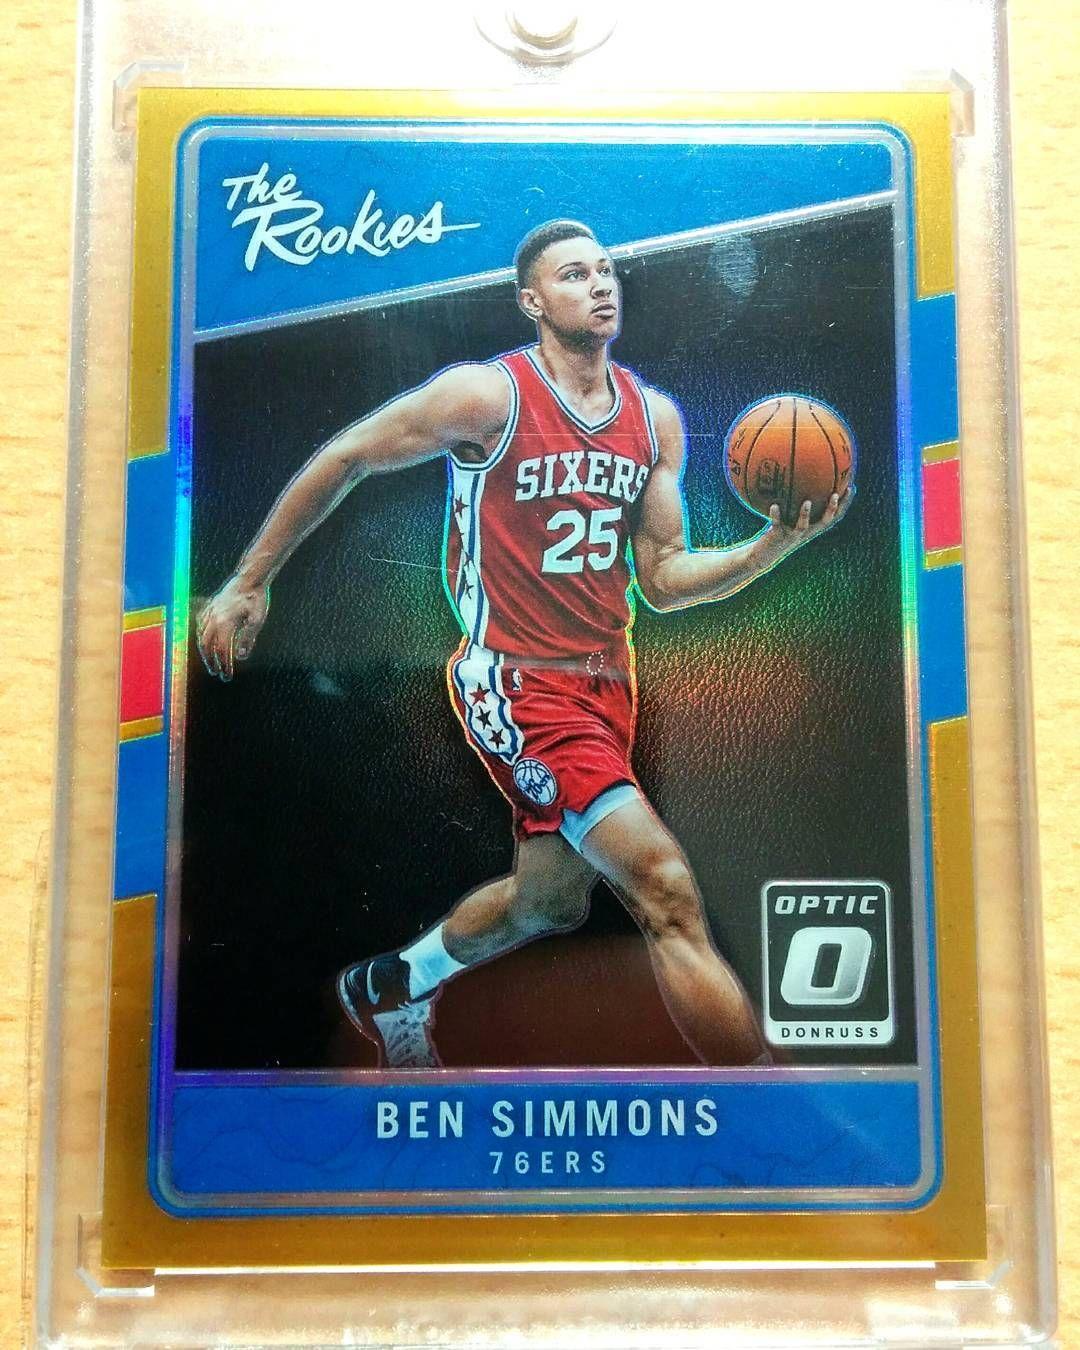 16-17 Panini Optic Donruss Ben Simmons RC The Rookies Gold holo  10 ... a2682cb6f